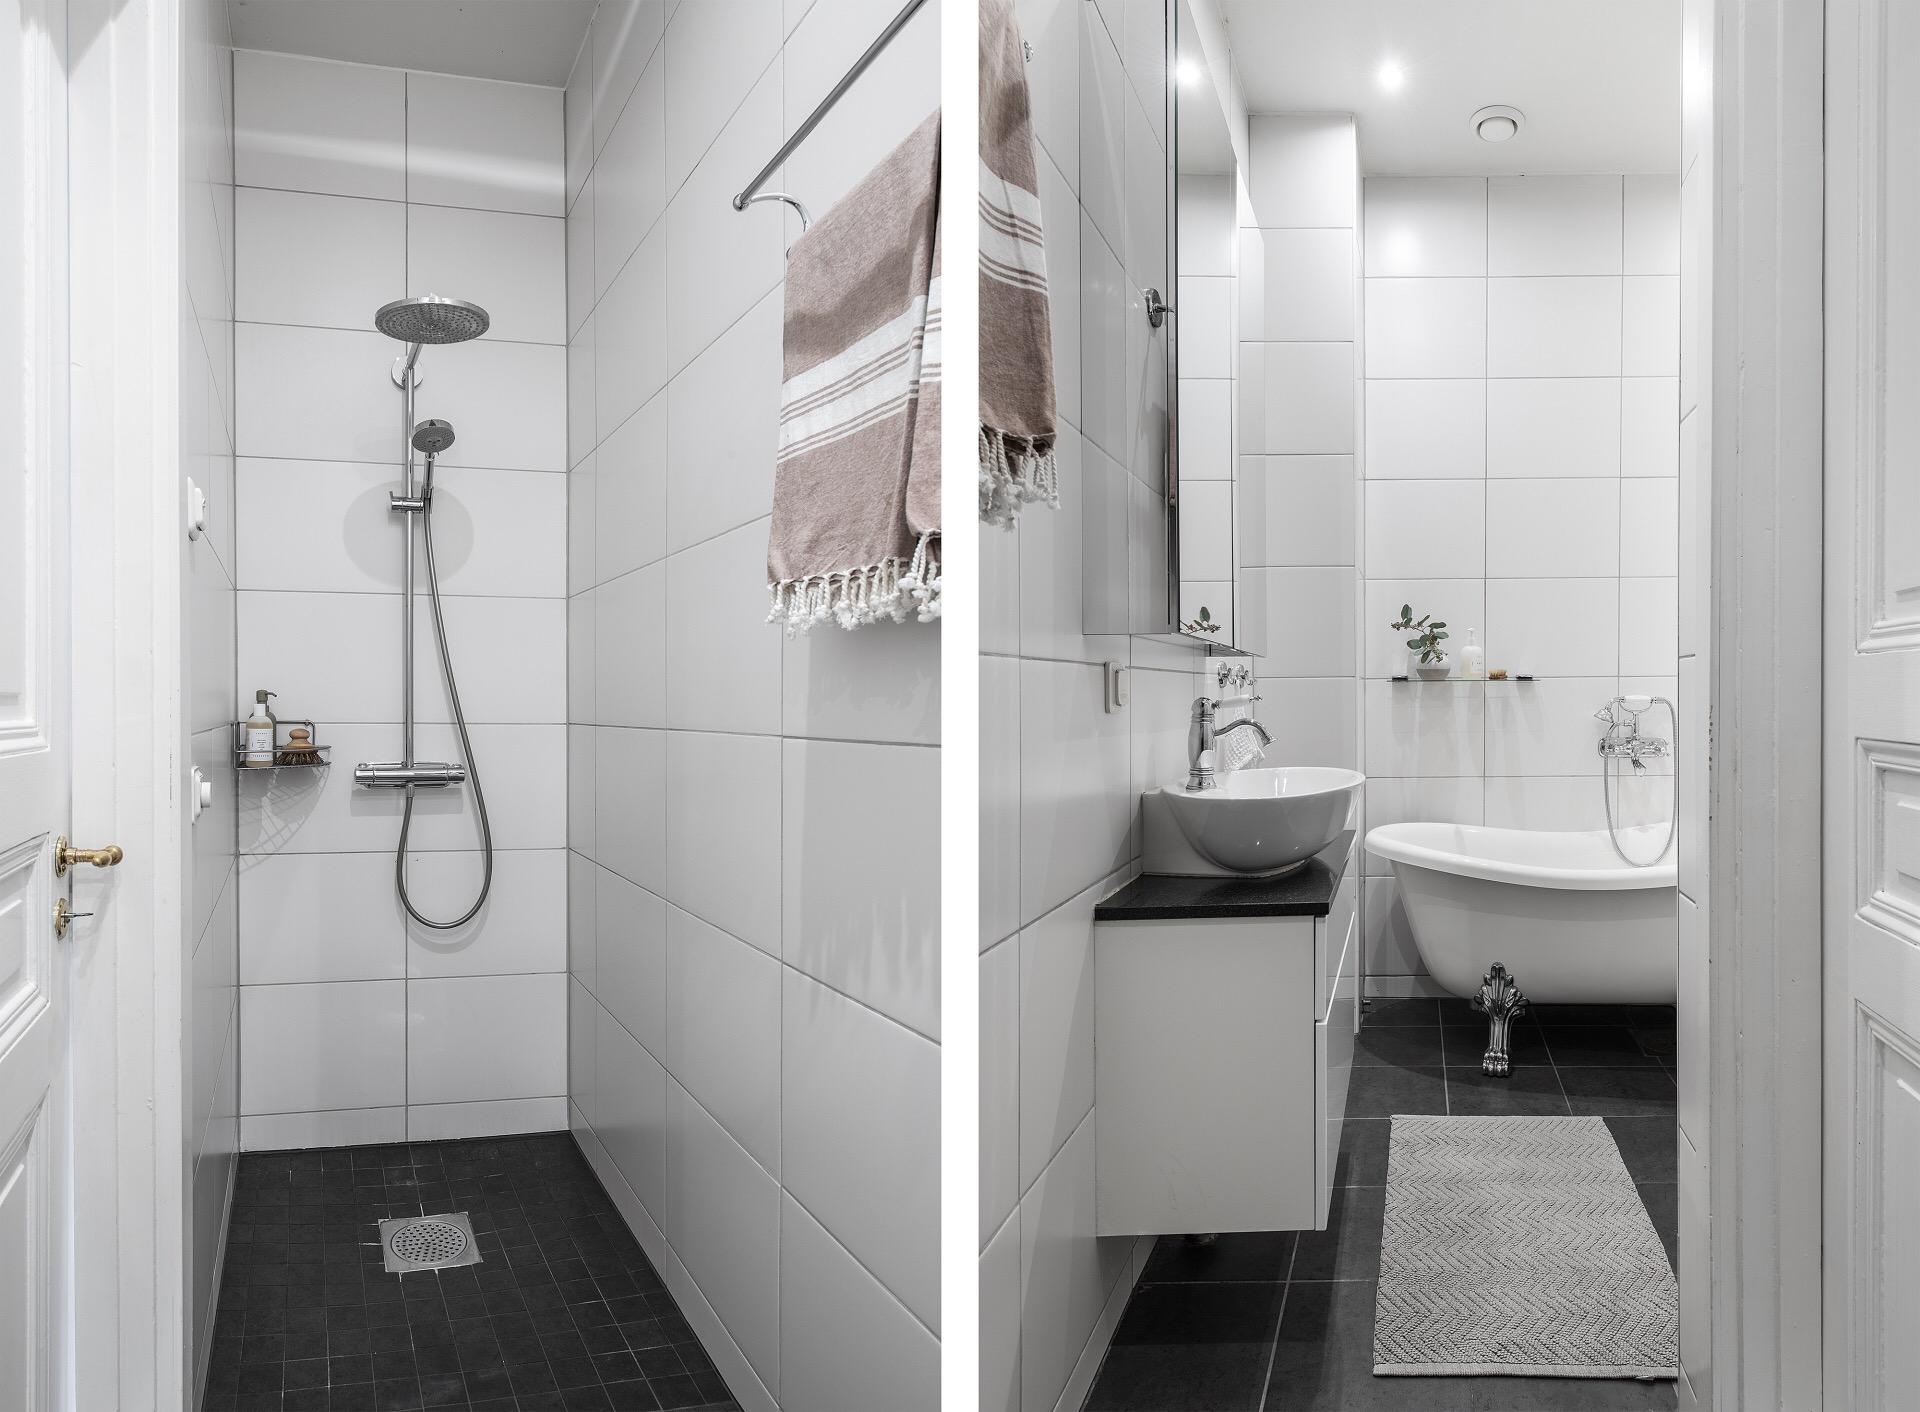 душ ванная раковина с тумбой